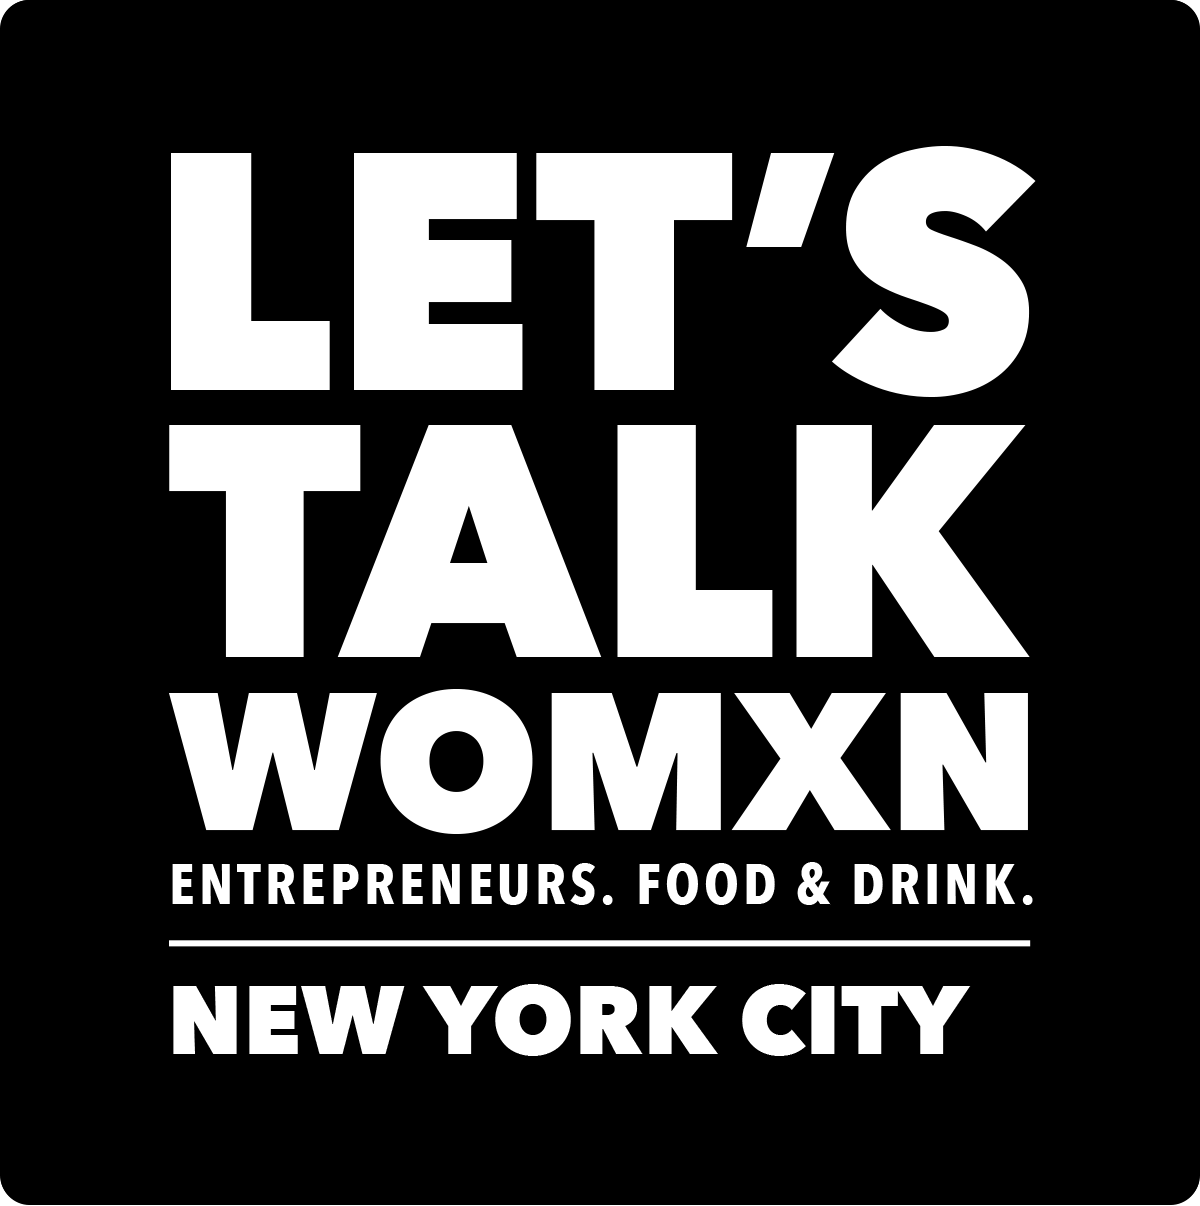 Let's Talk Womxn - New York City